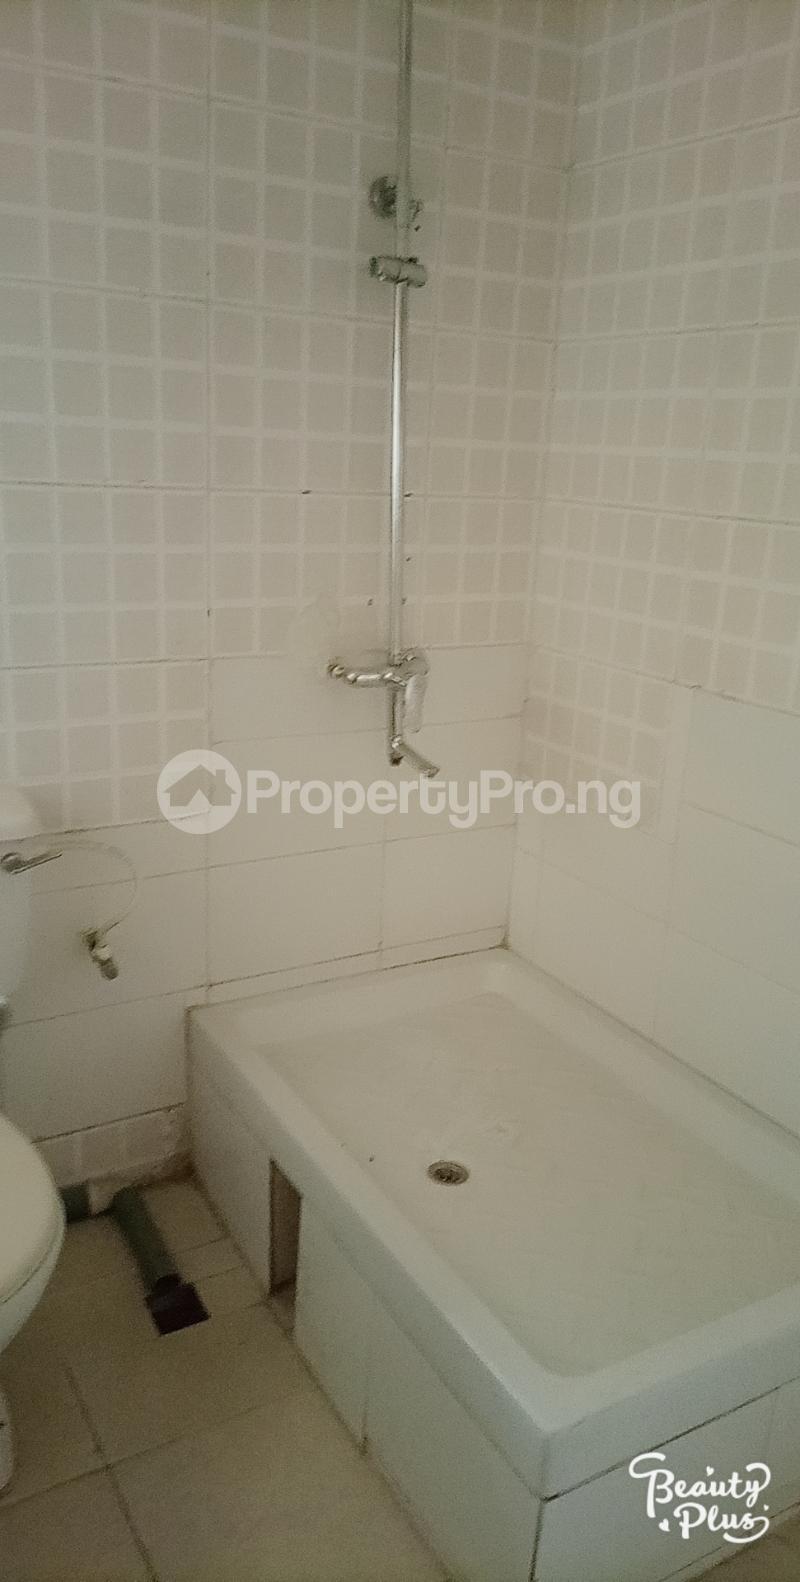 3 bedroom Flat / Apartment for rent Oke Afa isolo. Lagos Mainland Oke-Afa Isolo Lagos - 11